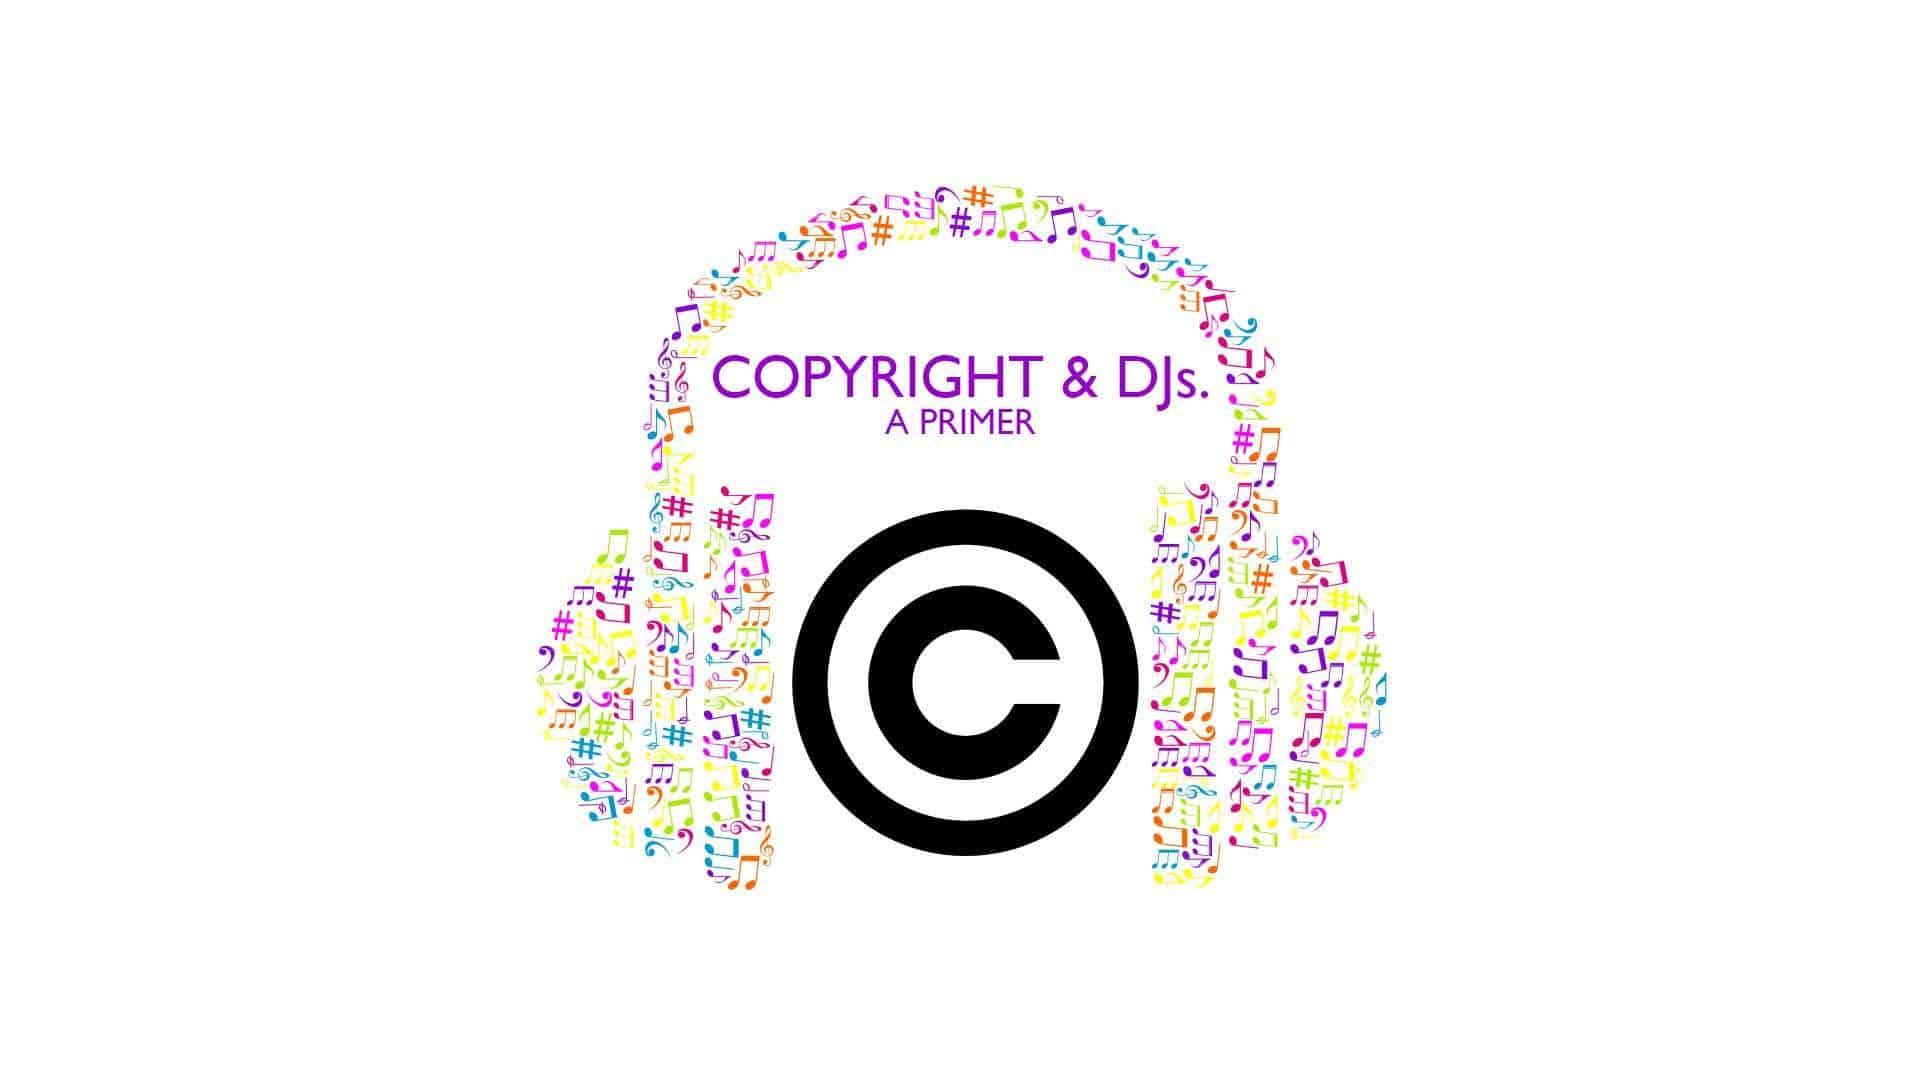 DJ's and Copyright. A Primer.